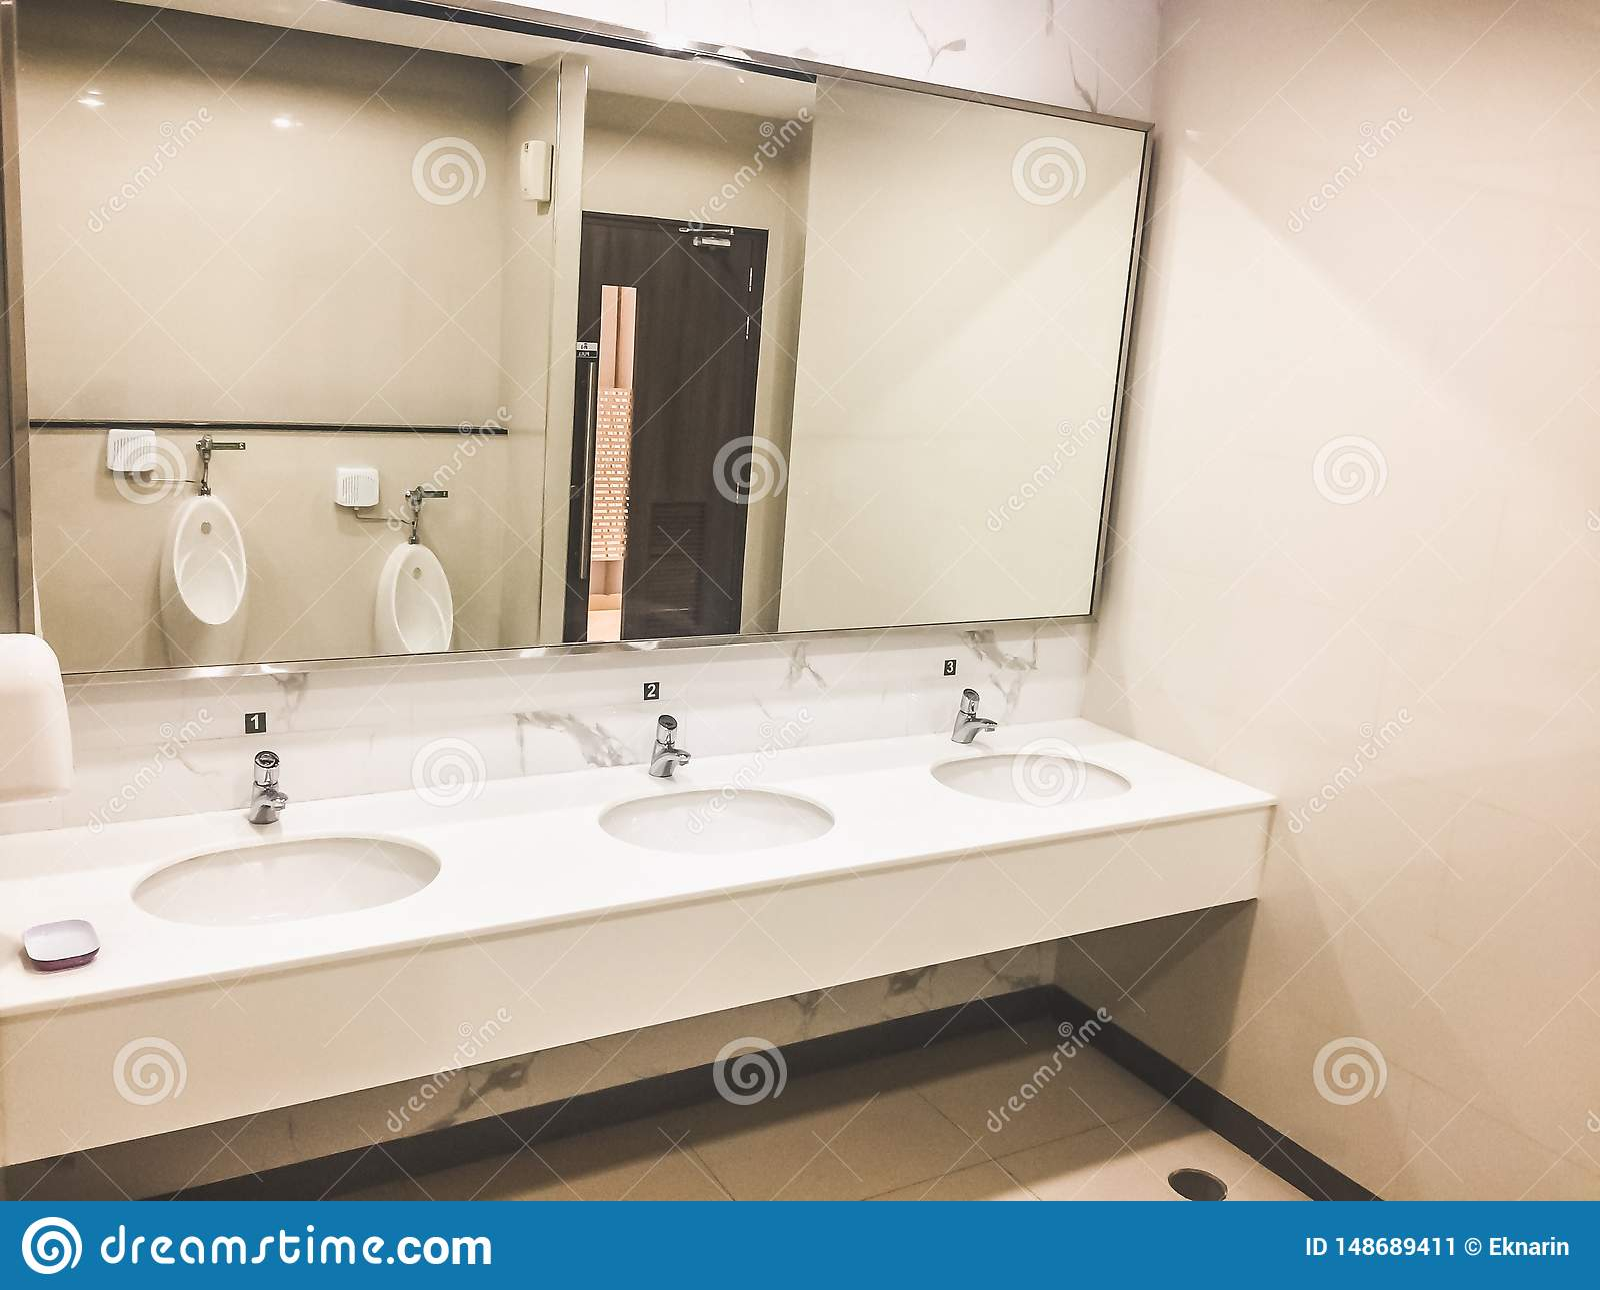 Men S Bathroom Interior Scene Stock Image Image Of Backgrounds Decoration 148689411